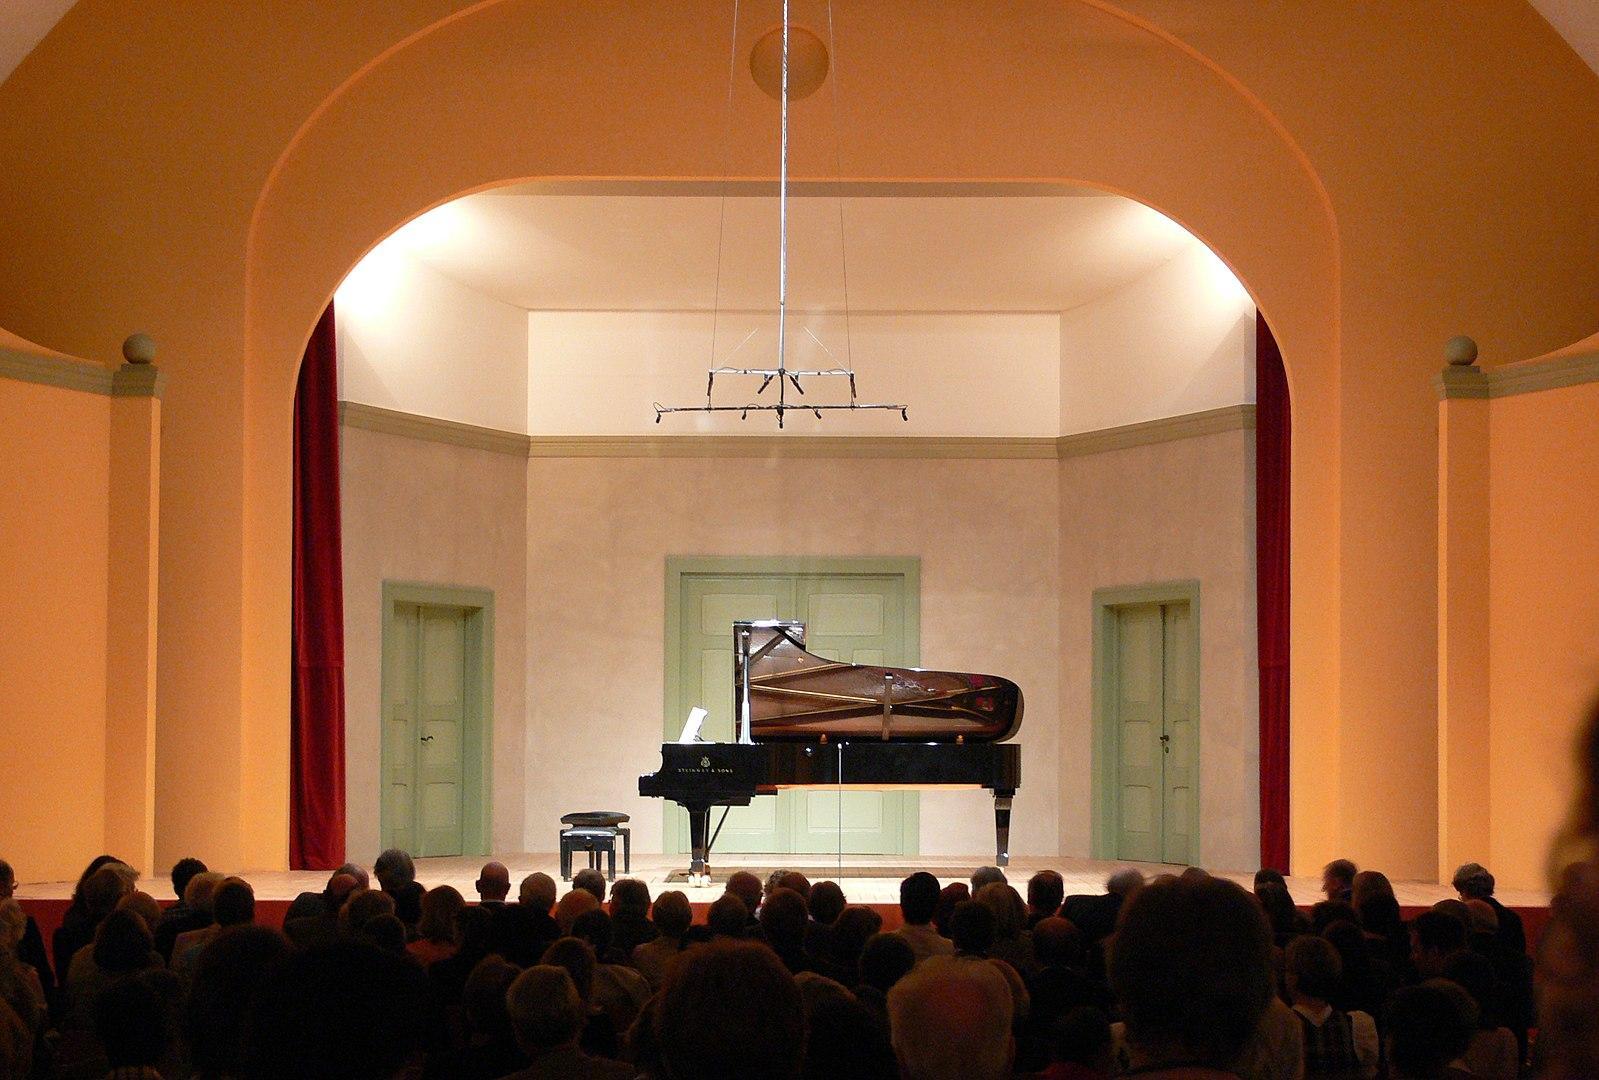 Andras Schiff's Schubert tiff blows up into full row